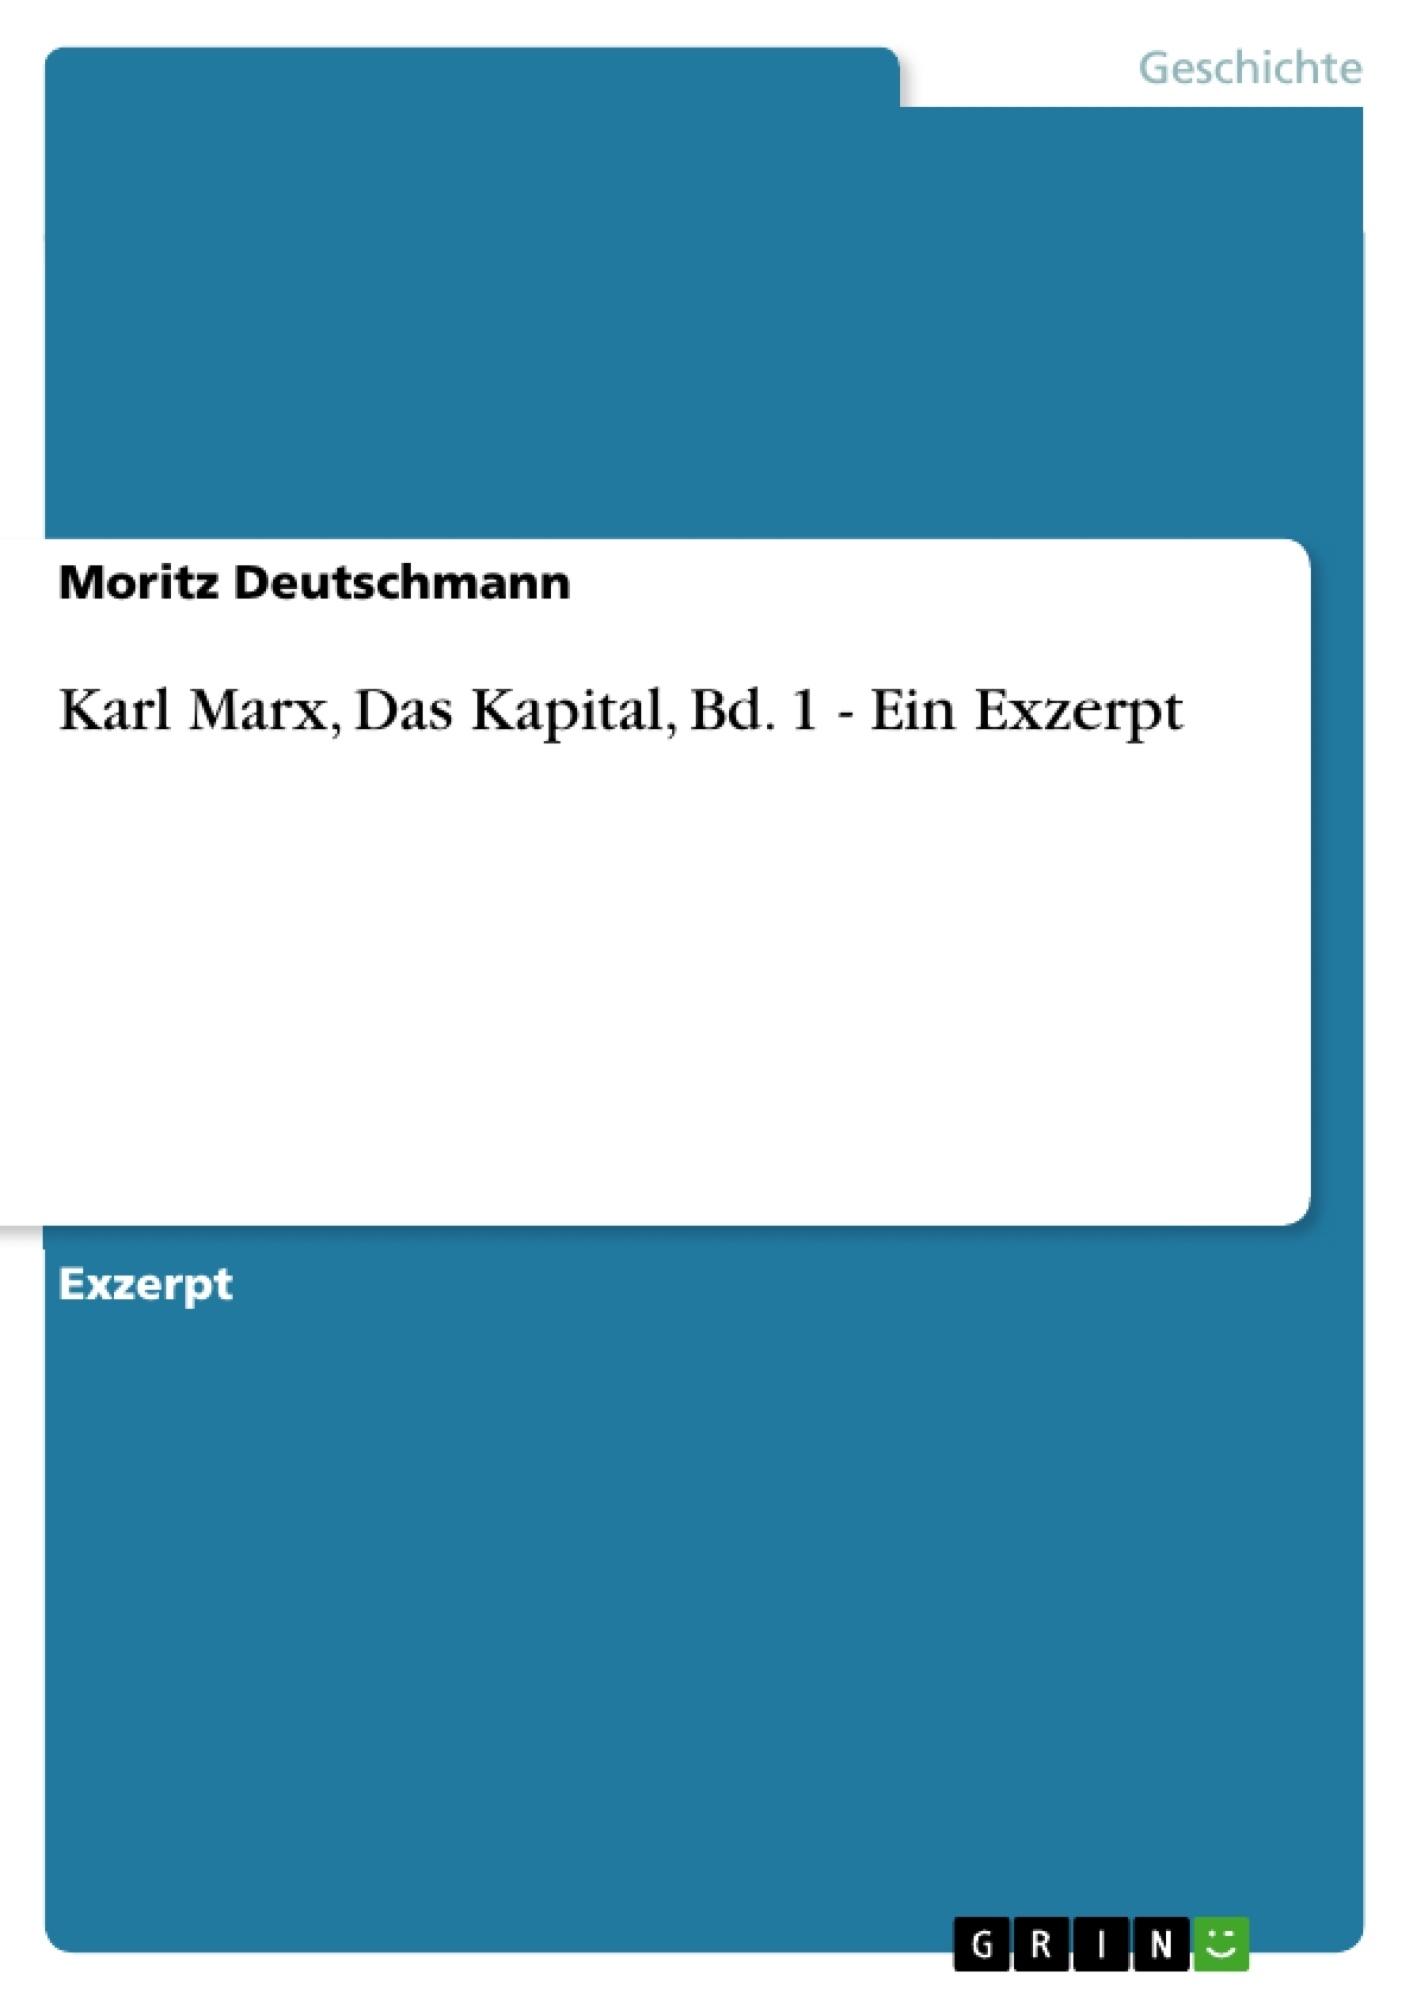 Titel: Karl Marx, Das Kapital, Bd. 1 - Ein Exzerpt